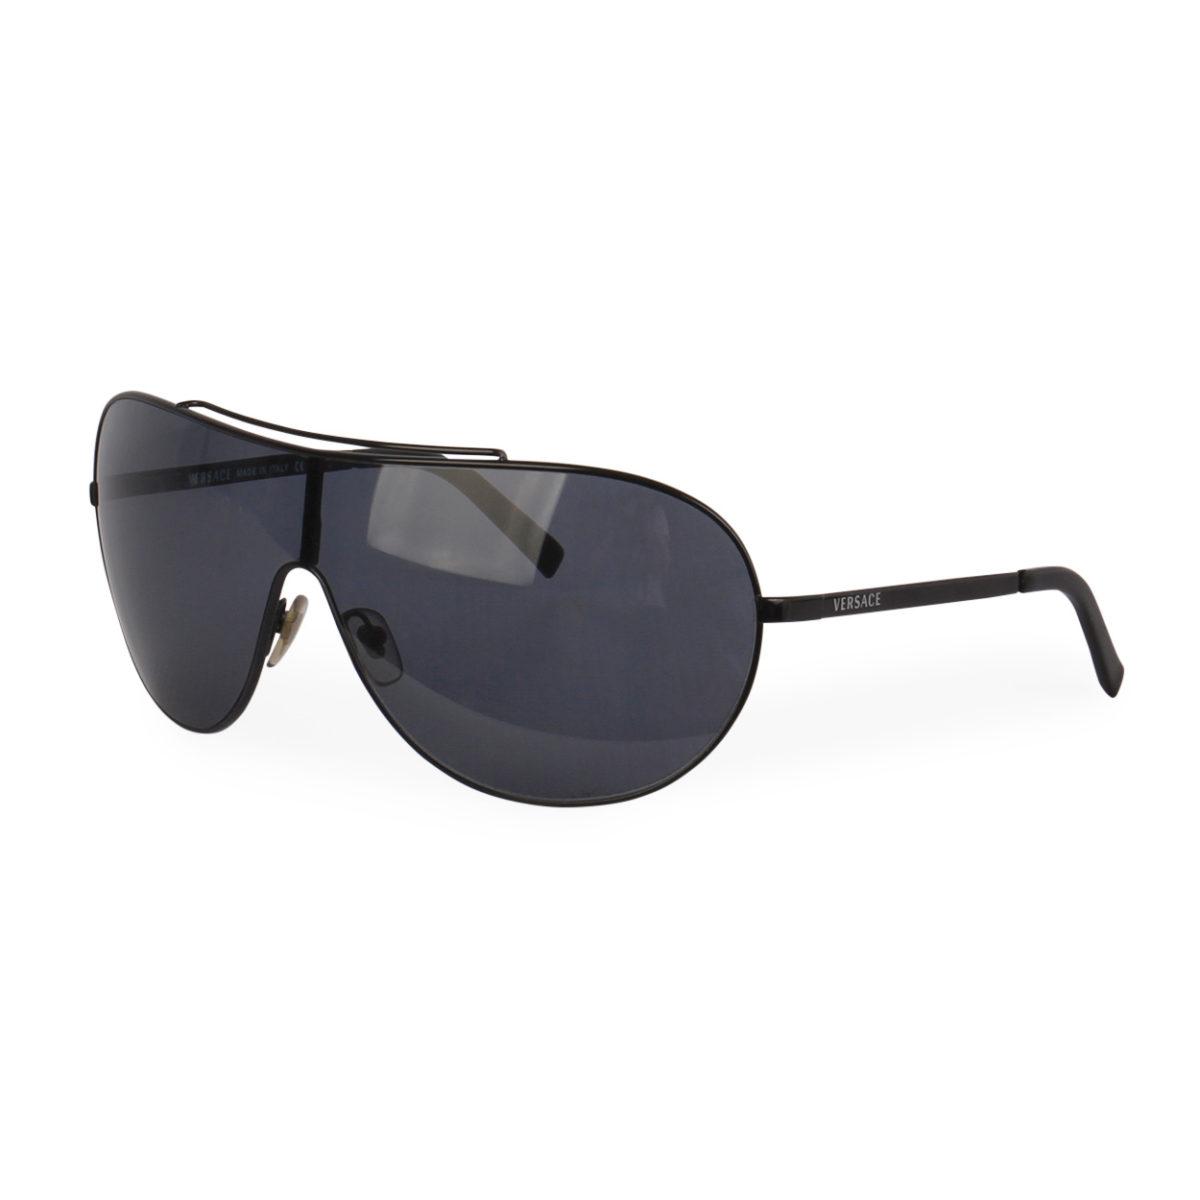 ce104f5f2a0 VERSACE Aviator Sunglasses 2056 Black